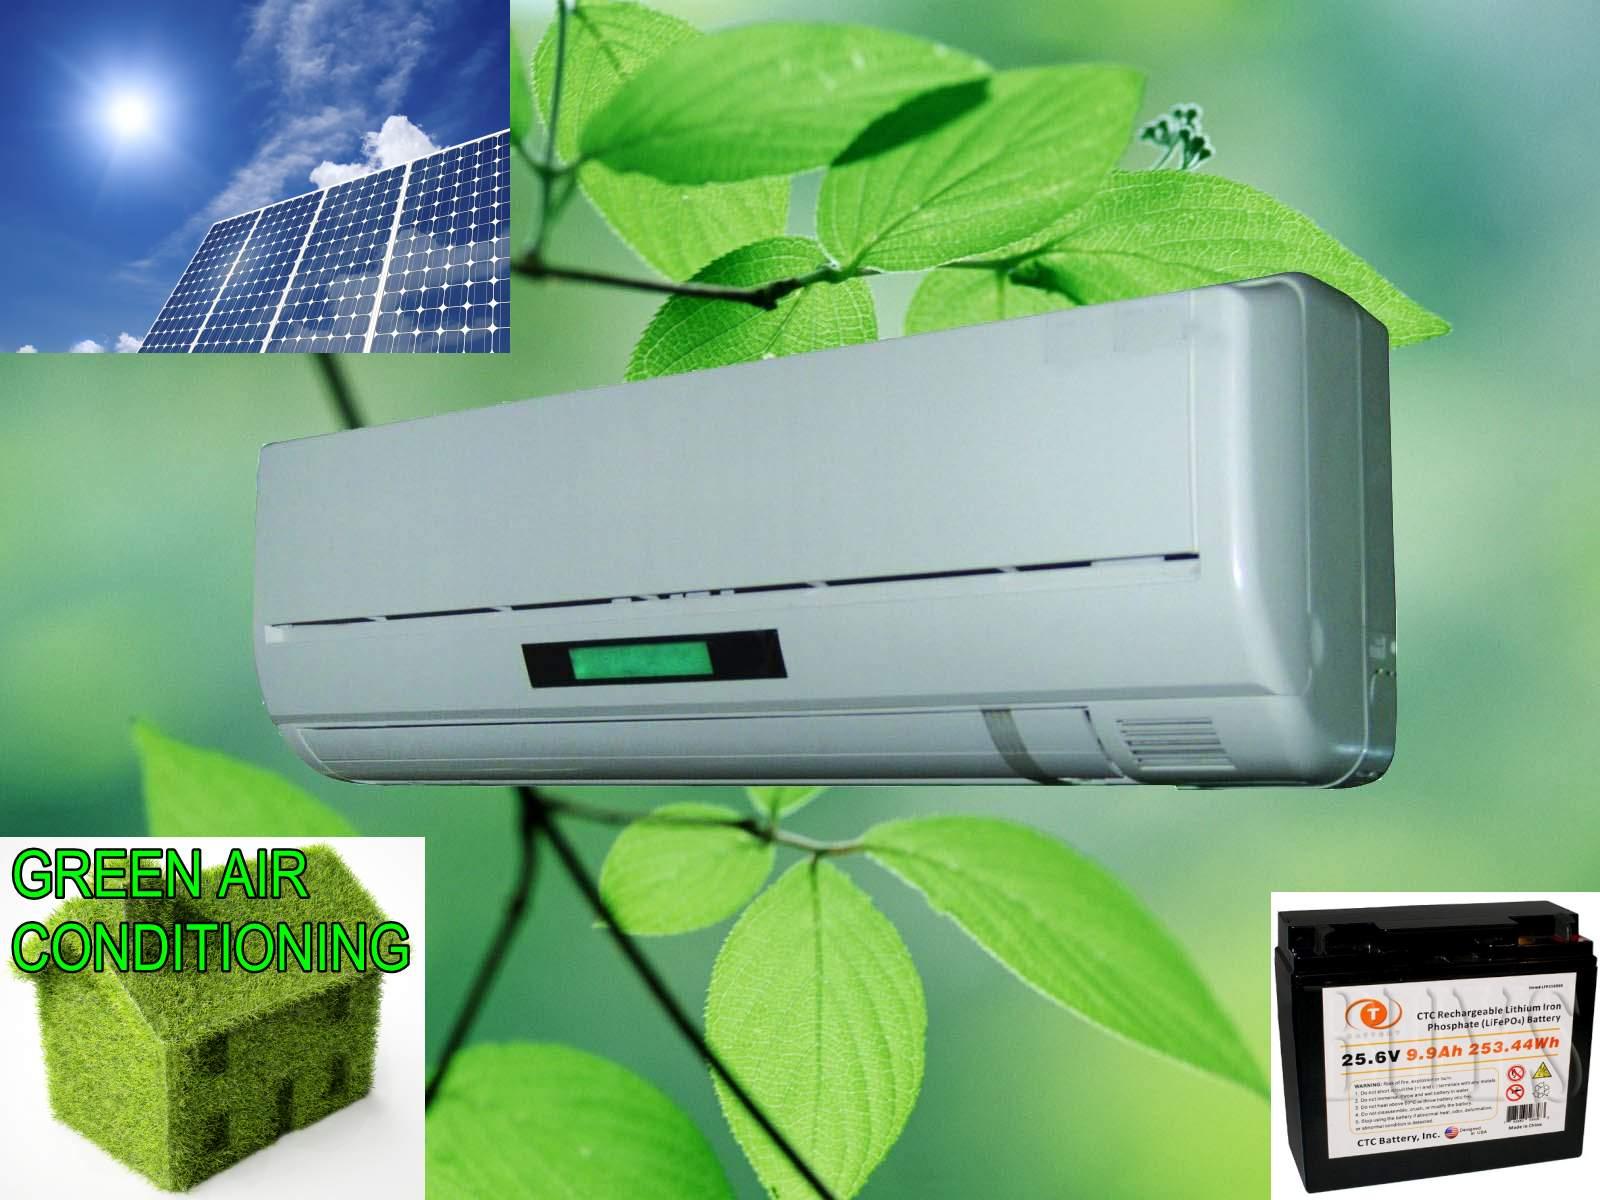 medium resolution of solar powered air conditioning unit